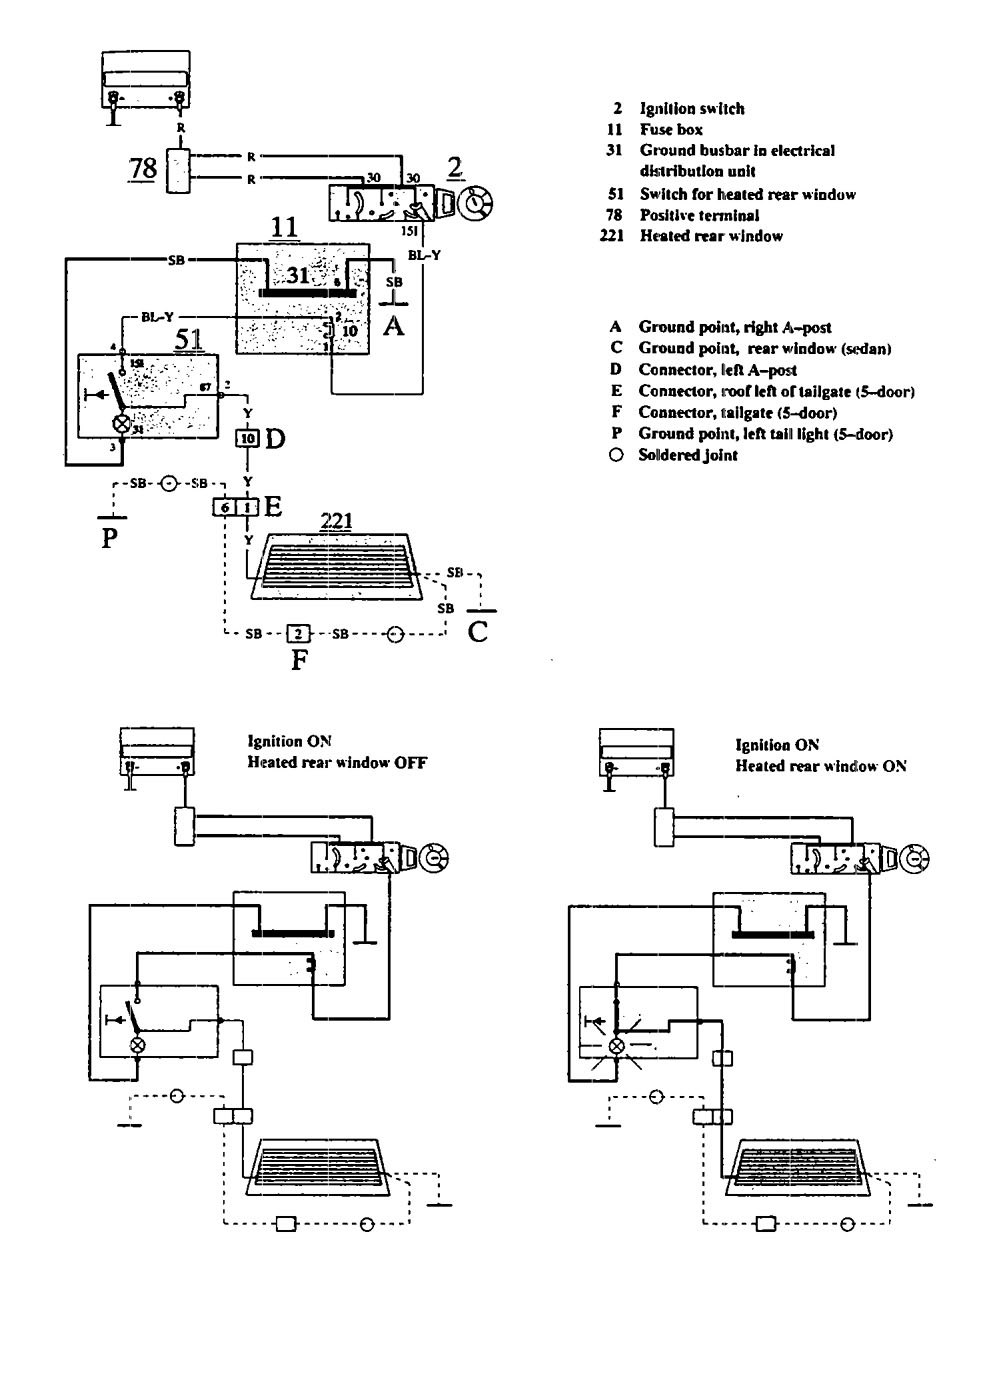 Volvo 740 Wiring Diagram 1991 Trusted Wiring Diagram 1990 Suzuki Sidekick  ECM 91 Suzuki Samurai Ecm Diagram